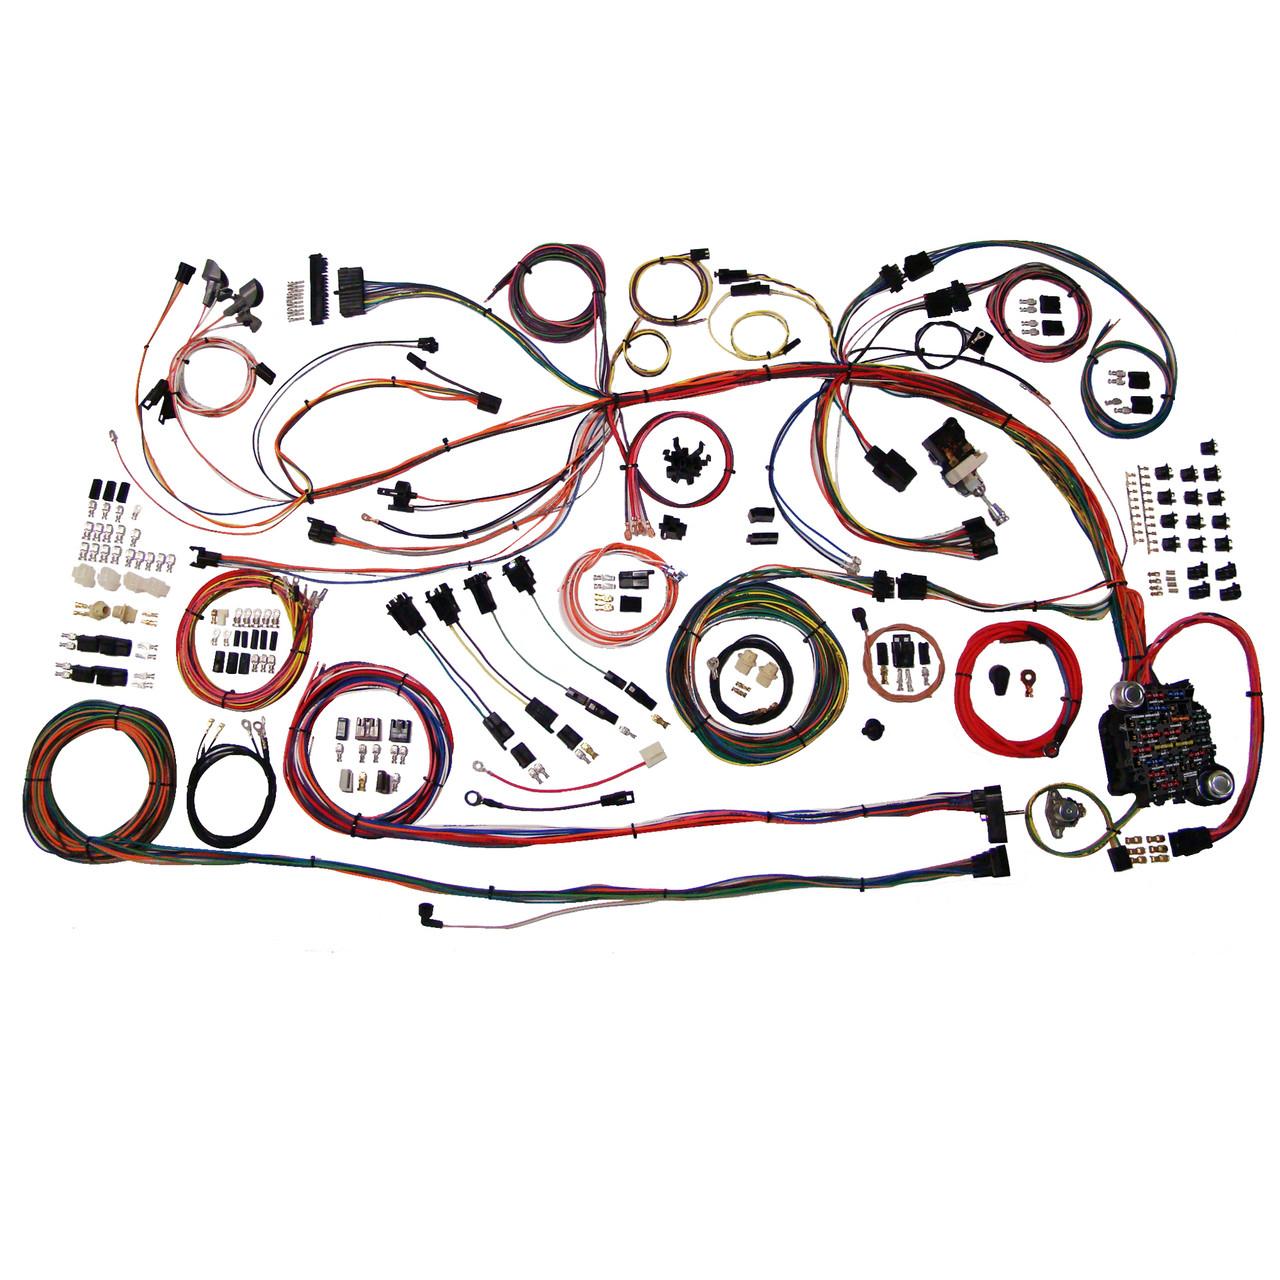 medium resolution of  el camino turn signal wiring diagram on 86 mustang wiring diagram 76 nova wiring diagram